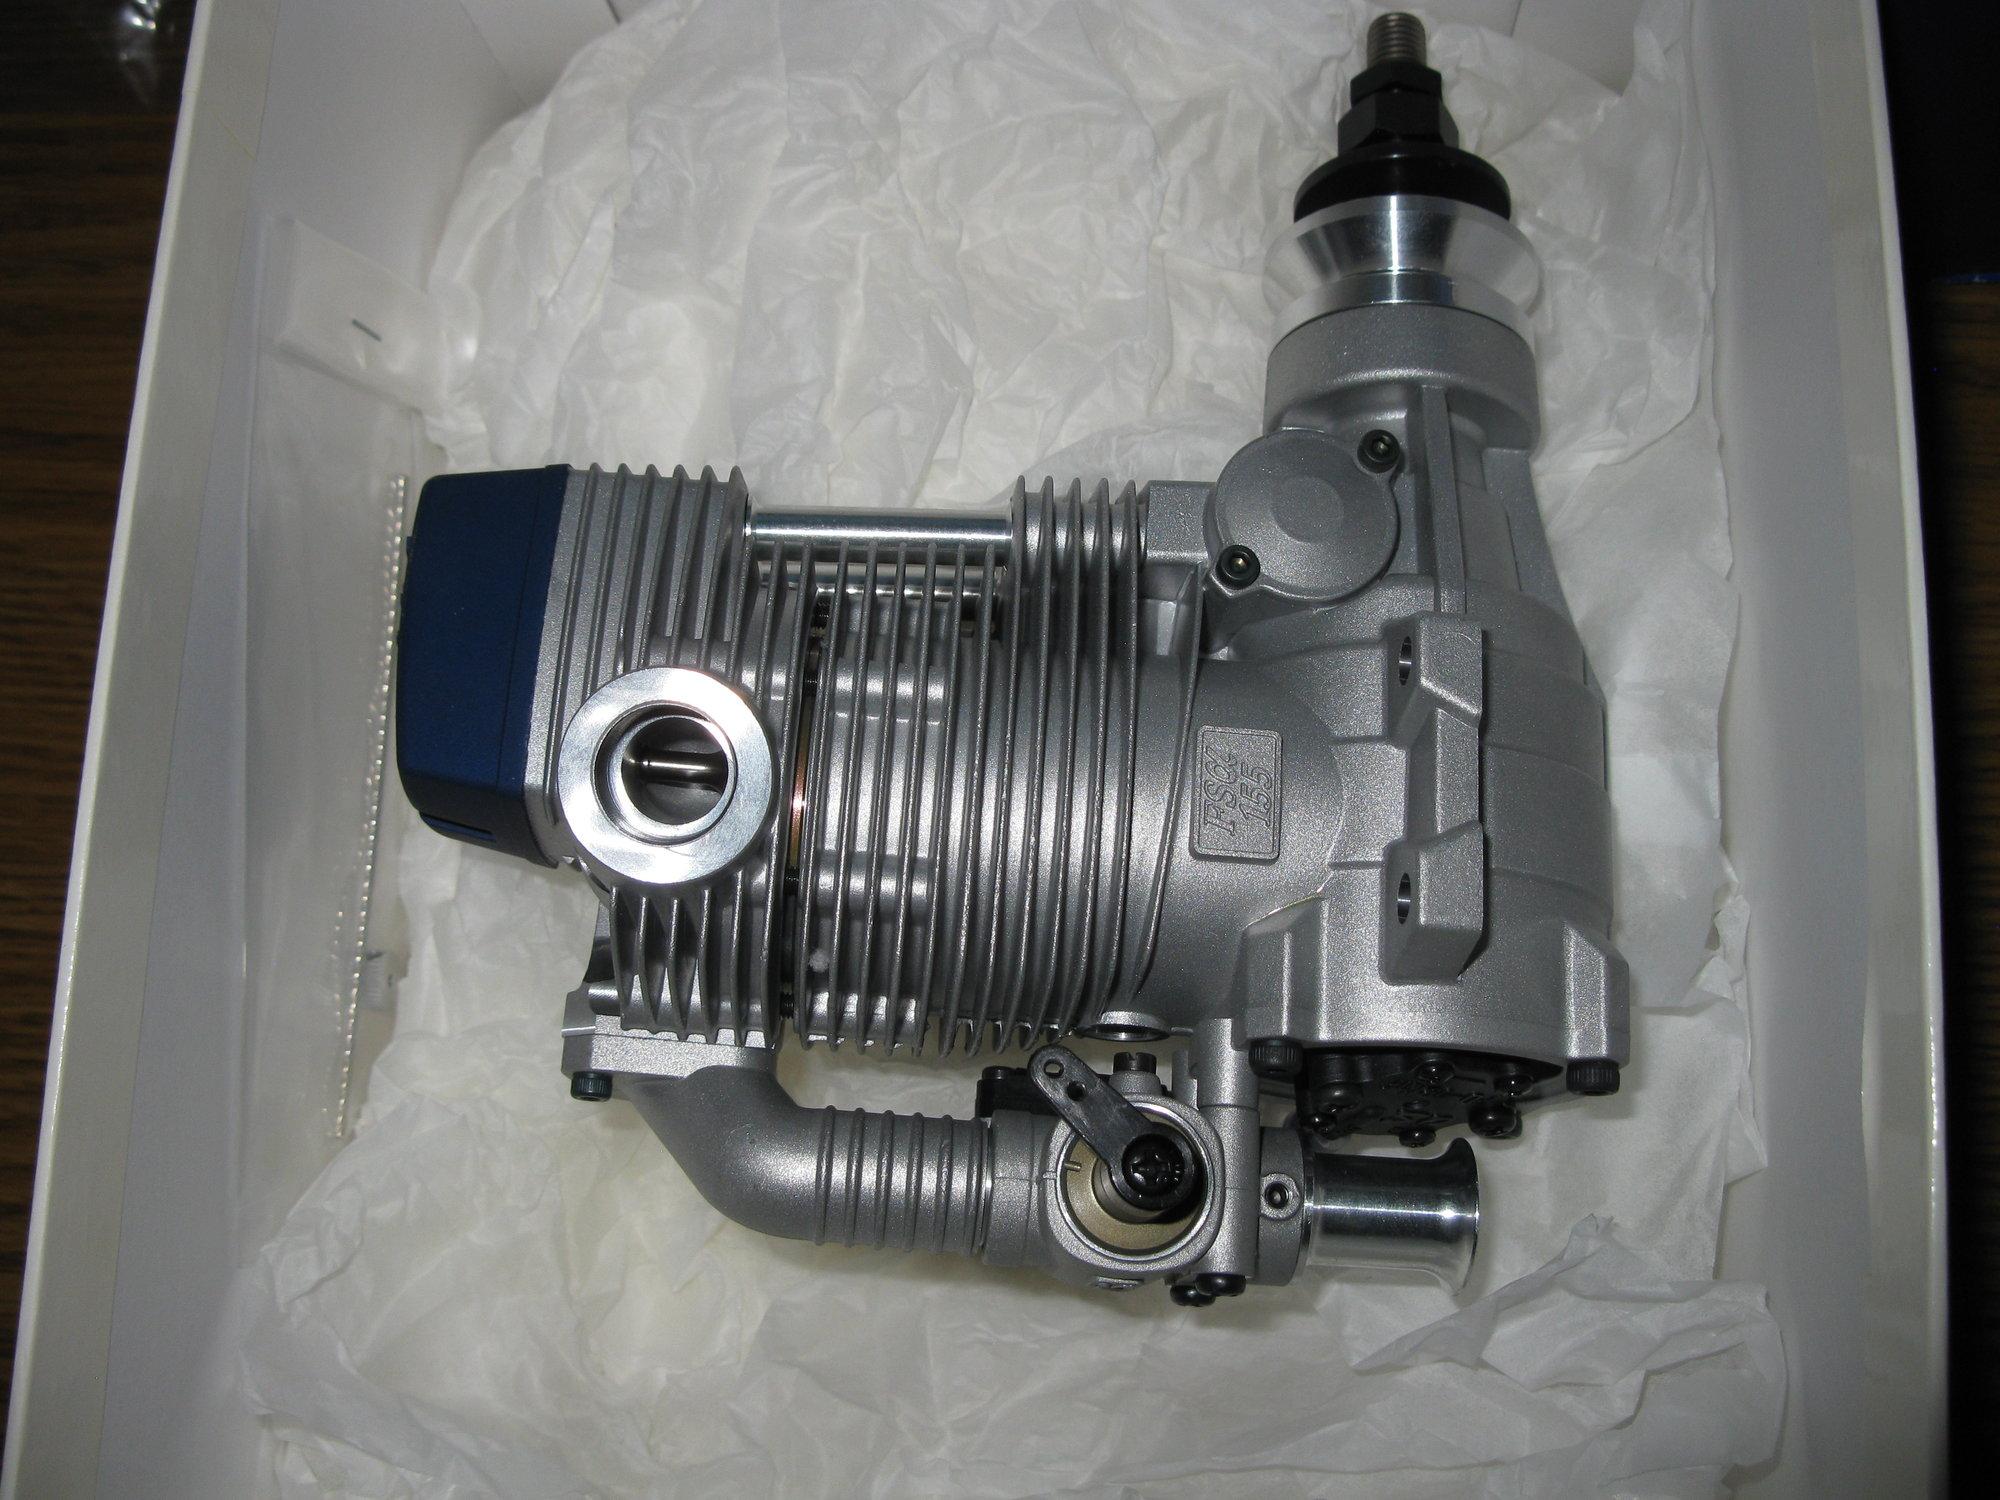 FS155-a Alpha Series 1.55 4-Stroke Pumped Engine 35430 O.S